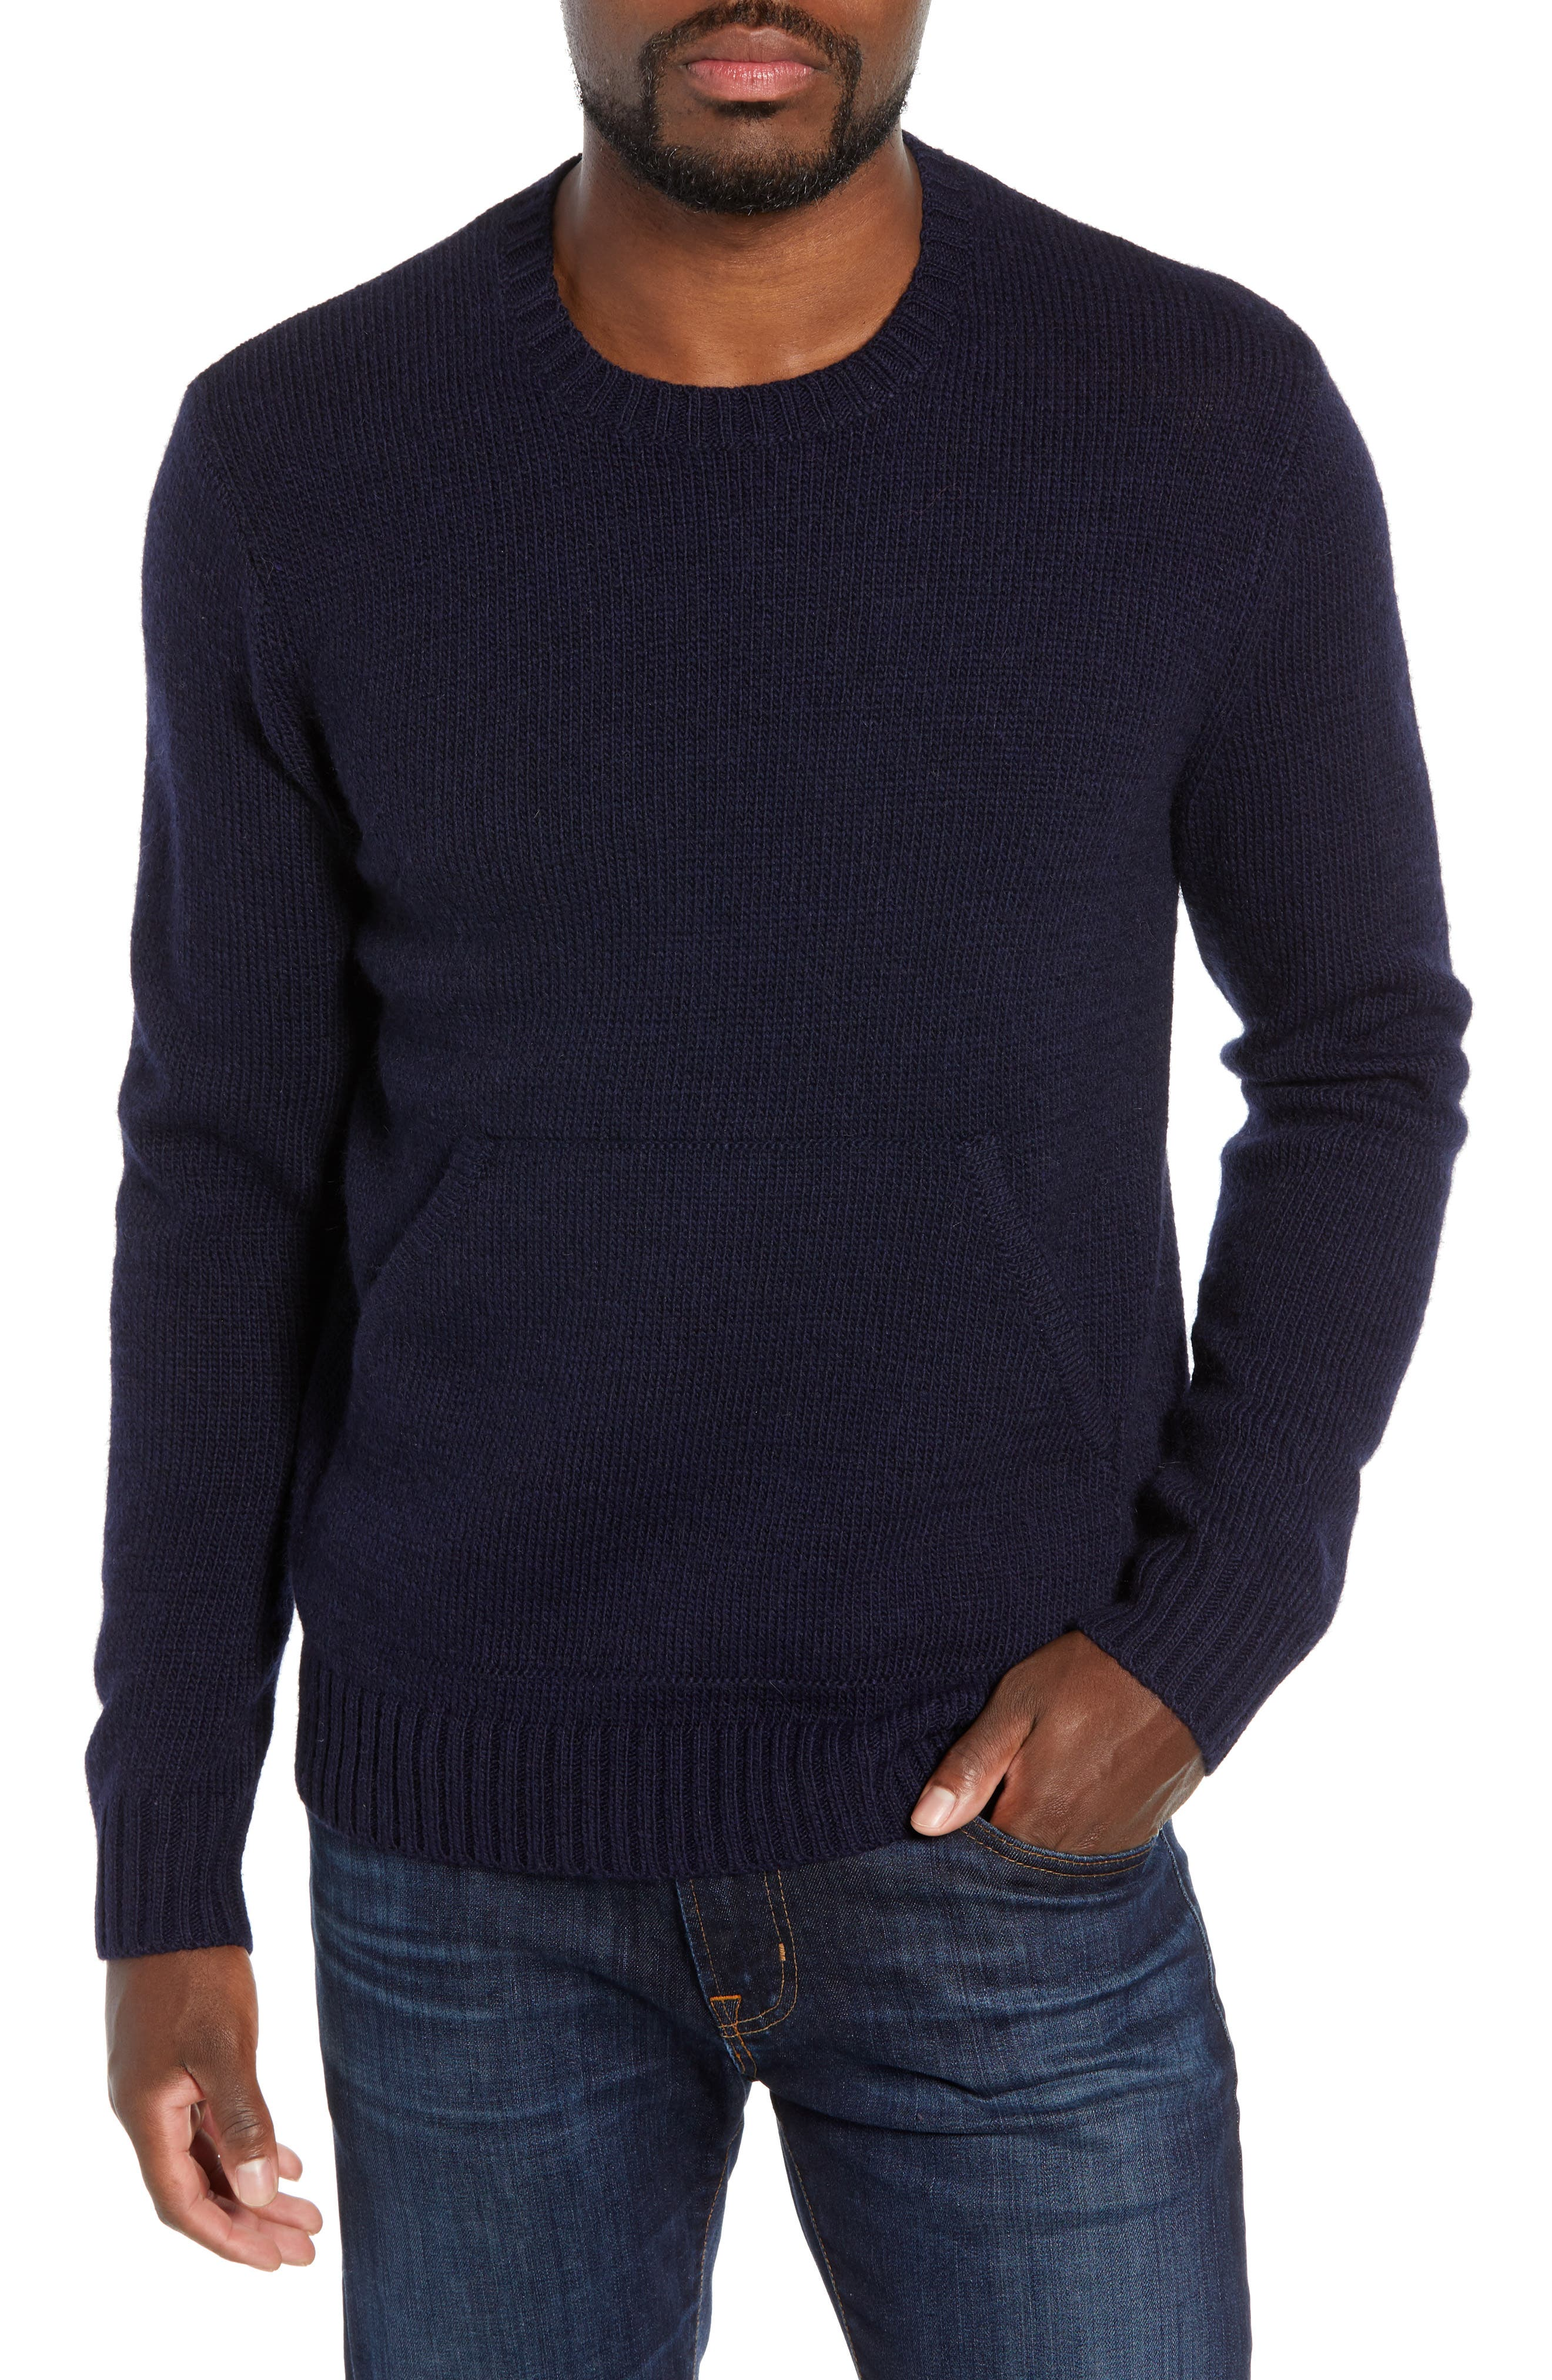 BONOBOS Slim Fit Kangaroo Pocket Sweater in Navy